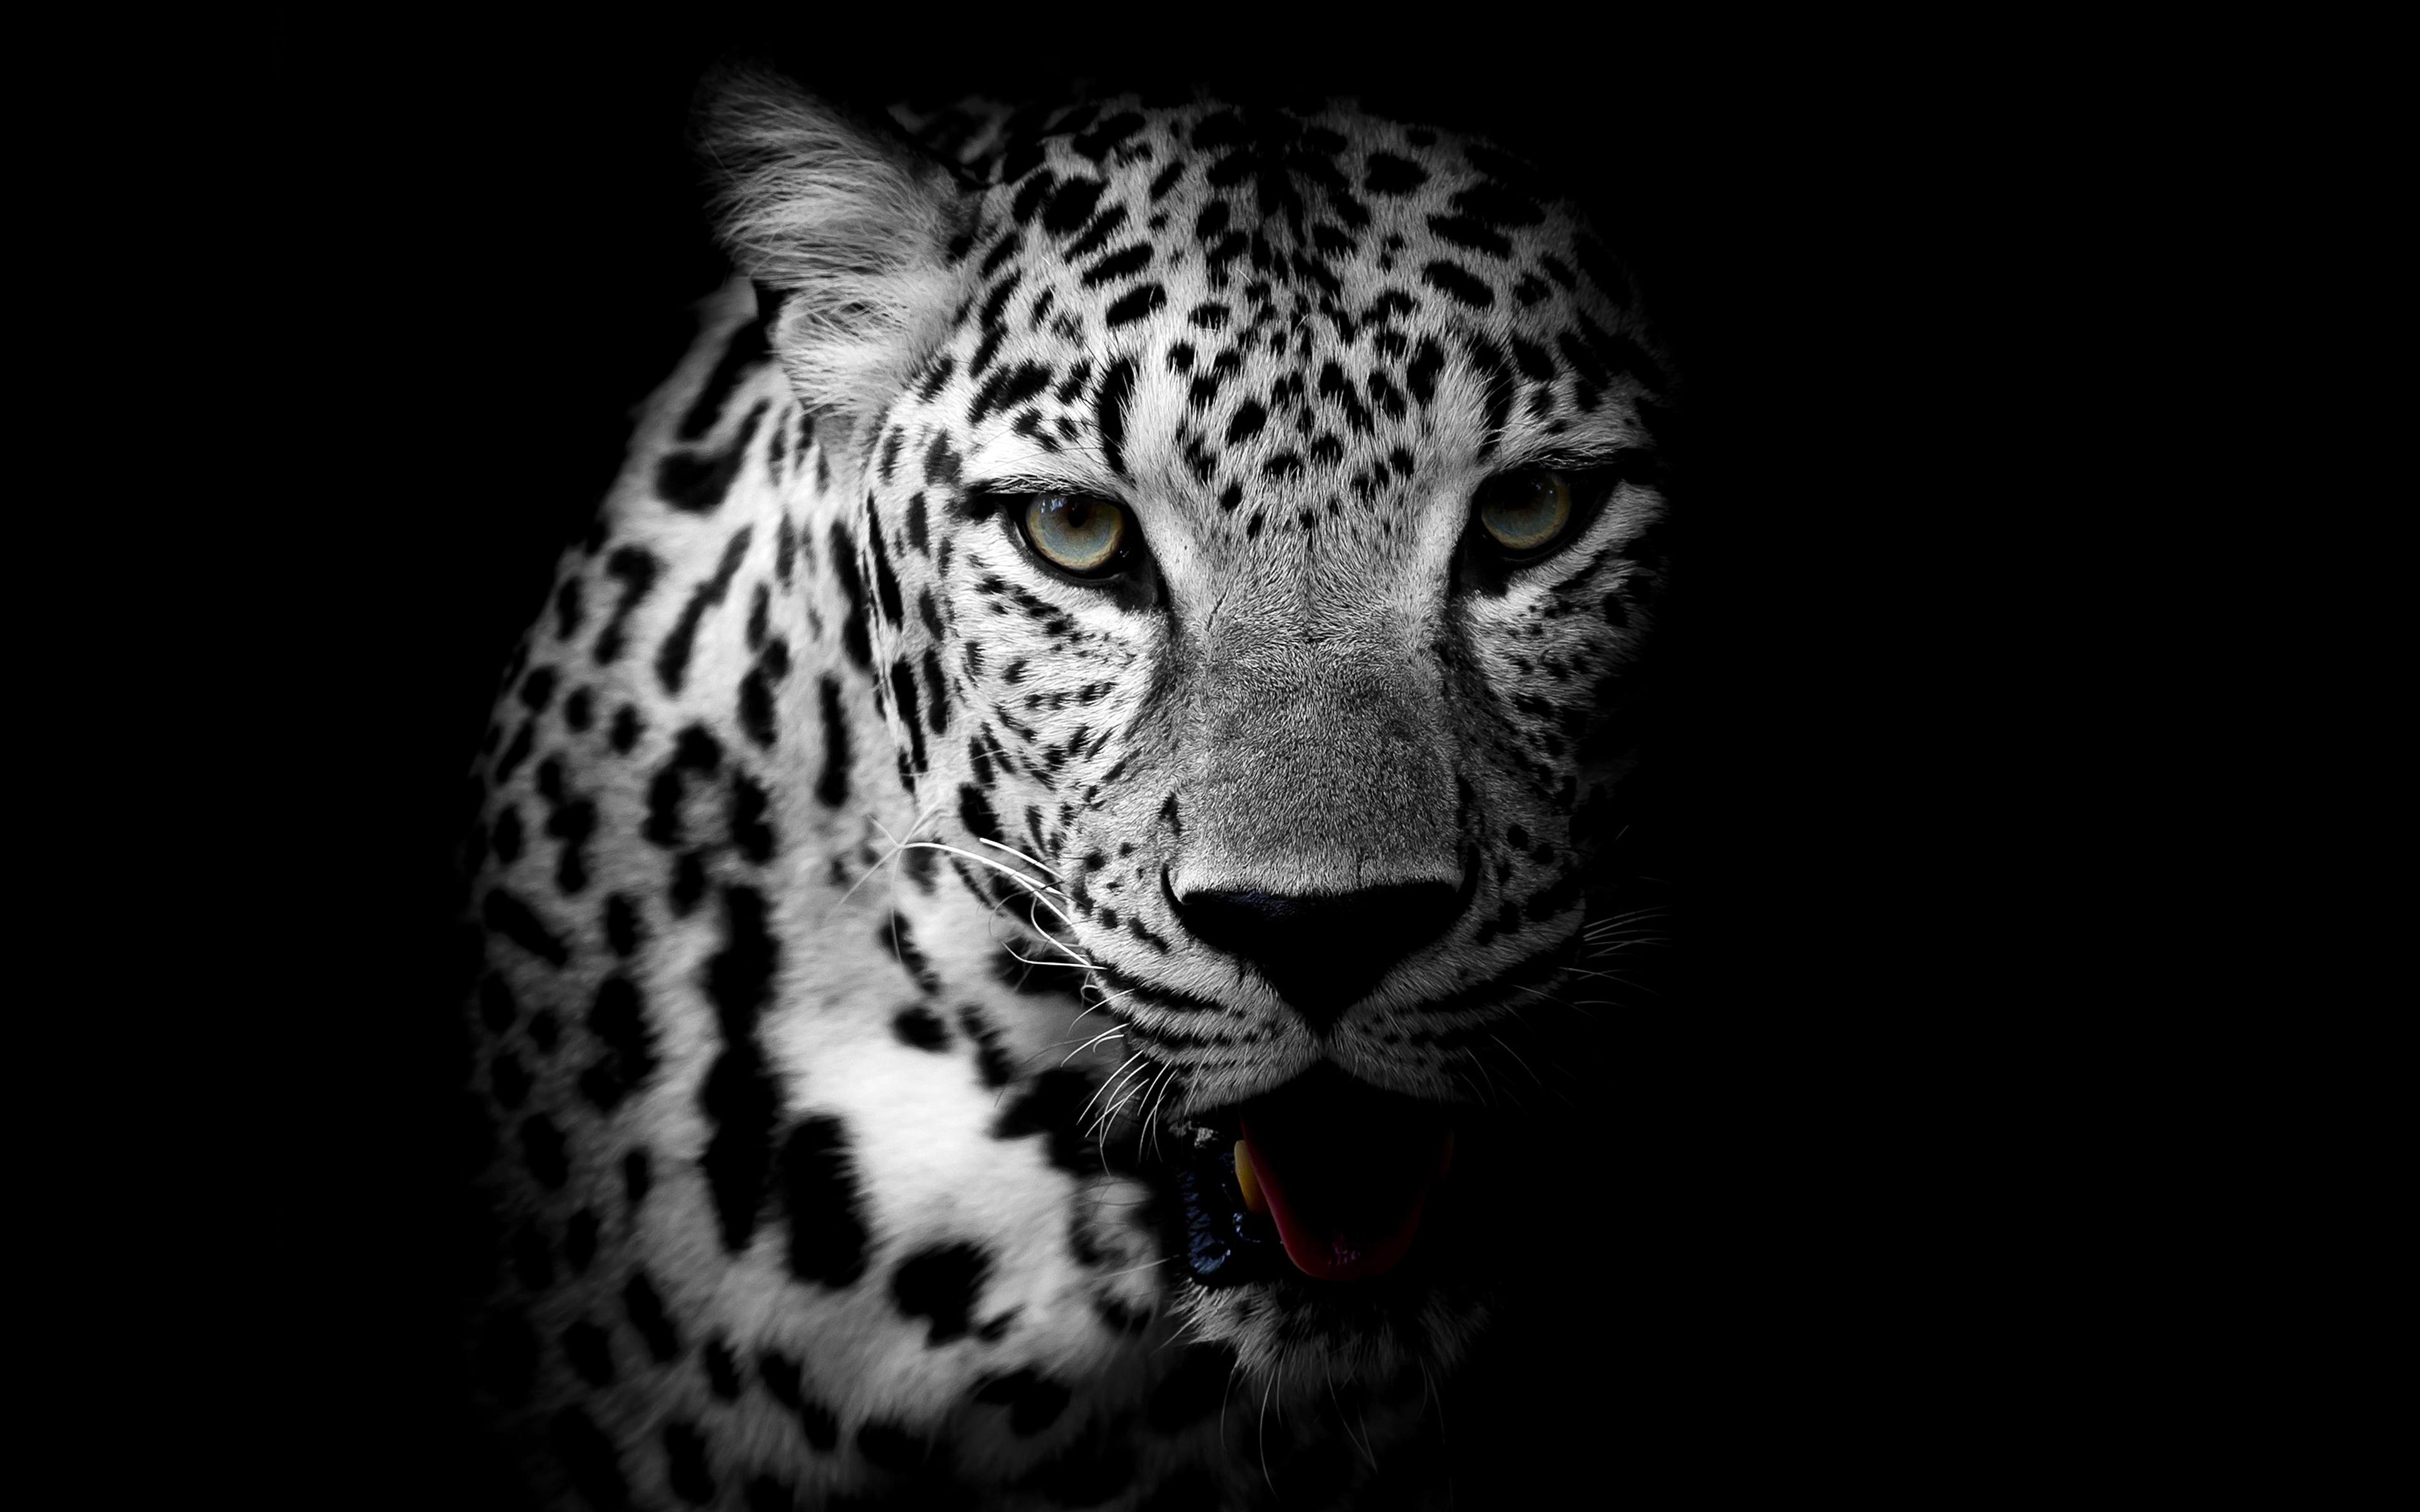 Картинки леопарда черно-белые